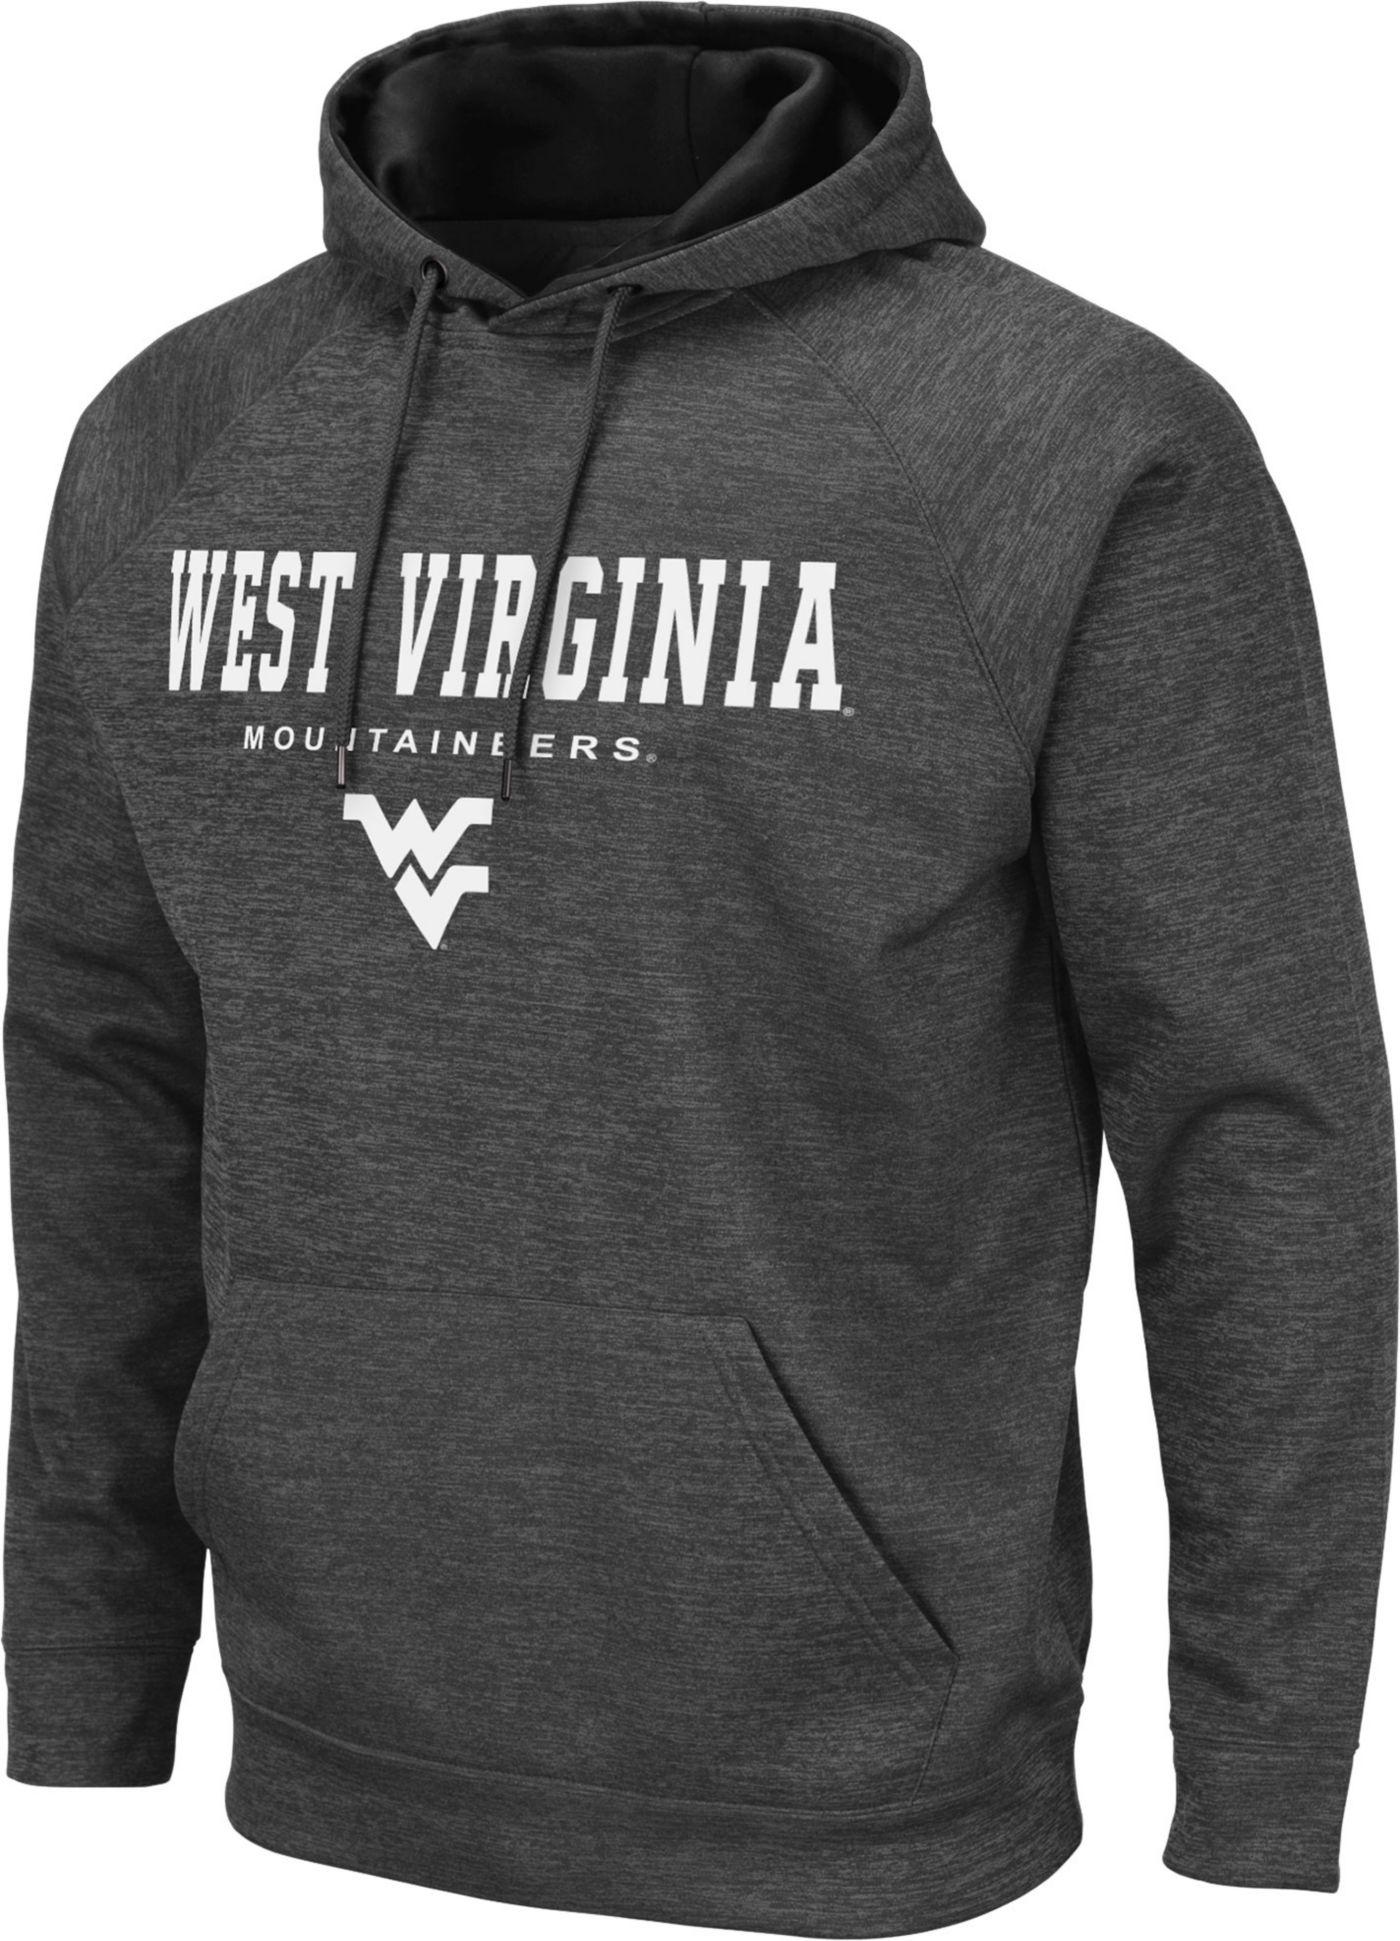 Colosseum Men's West Virginia Mountaineers Grey Pullover Hoodie